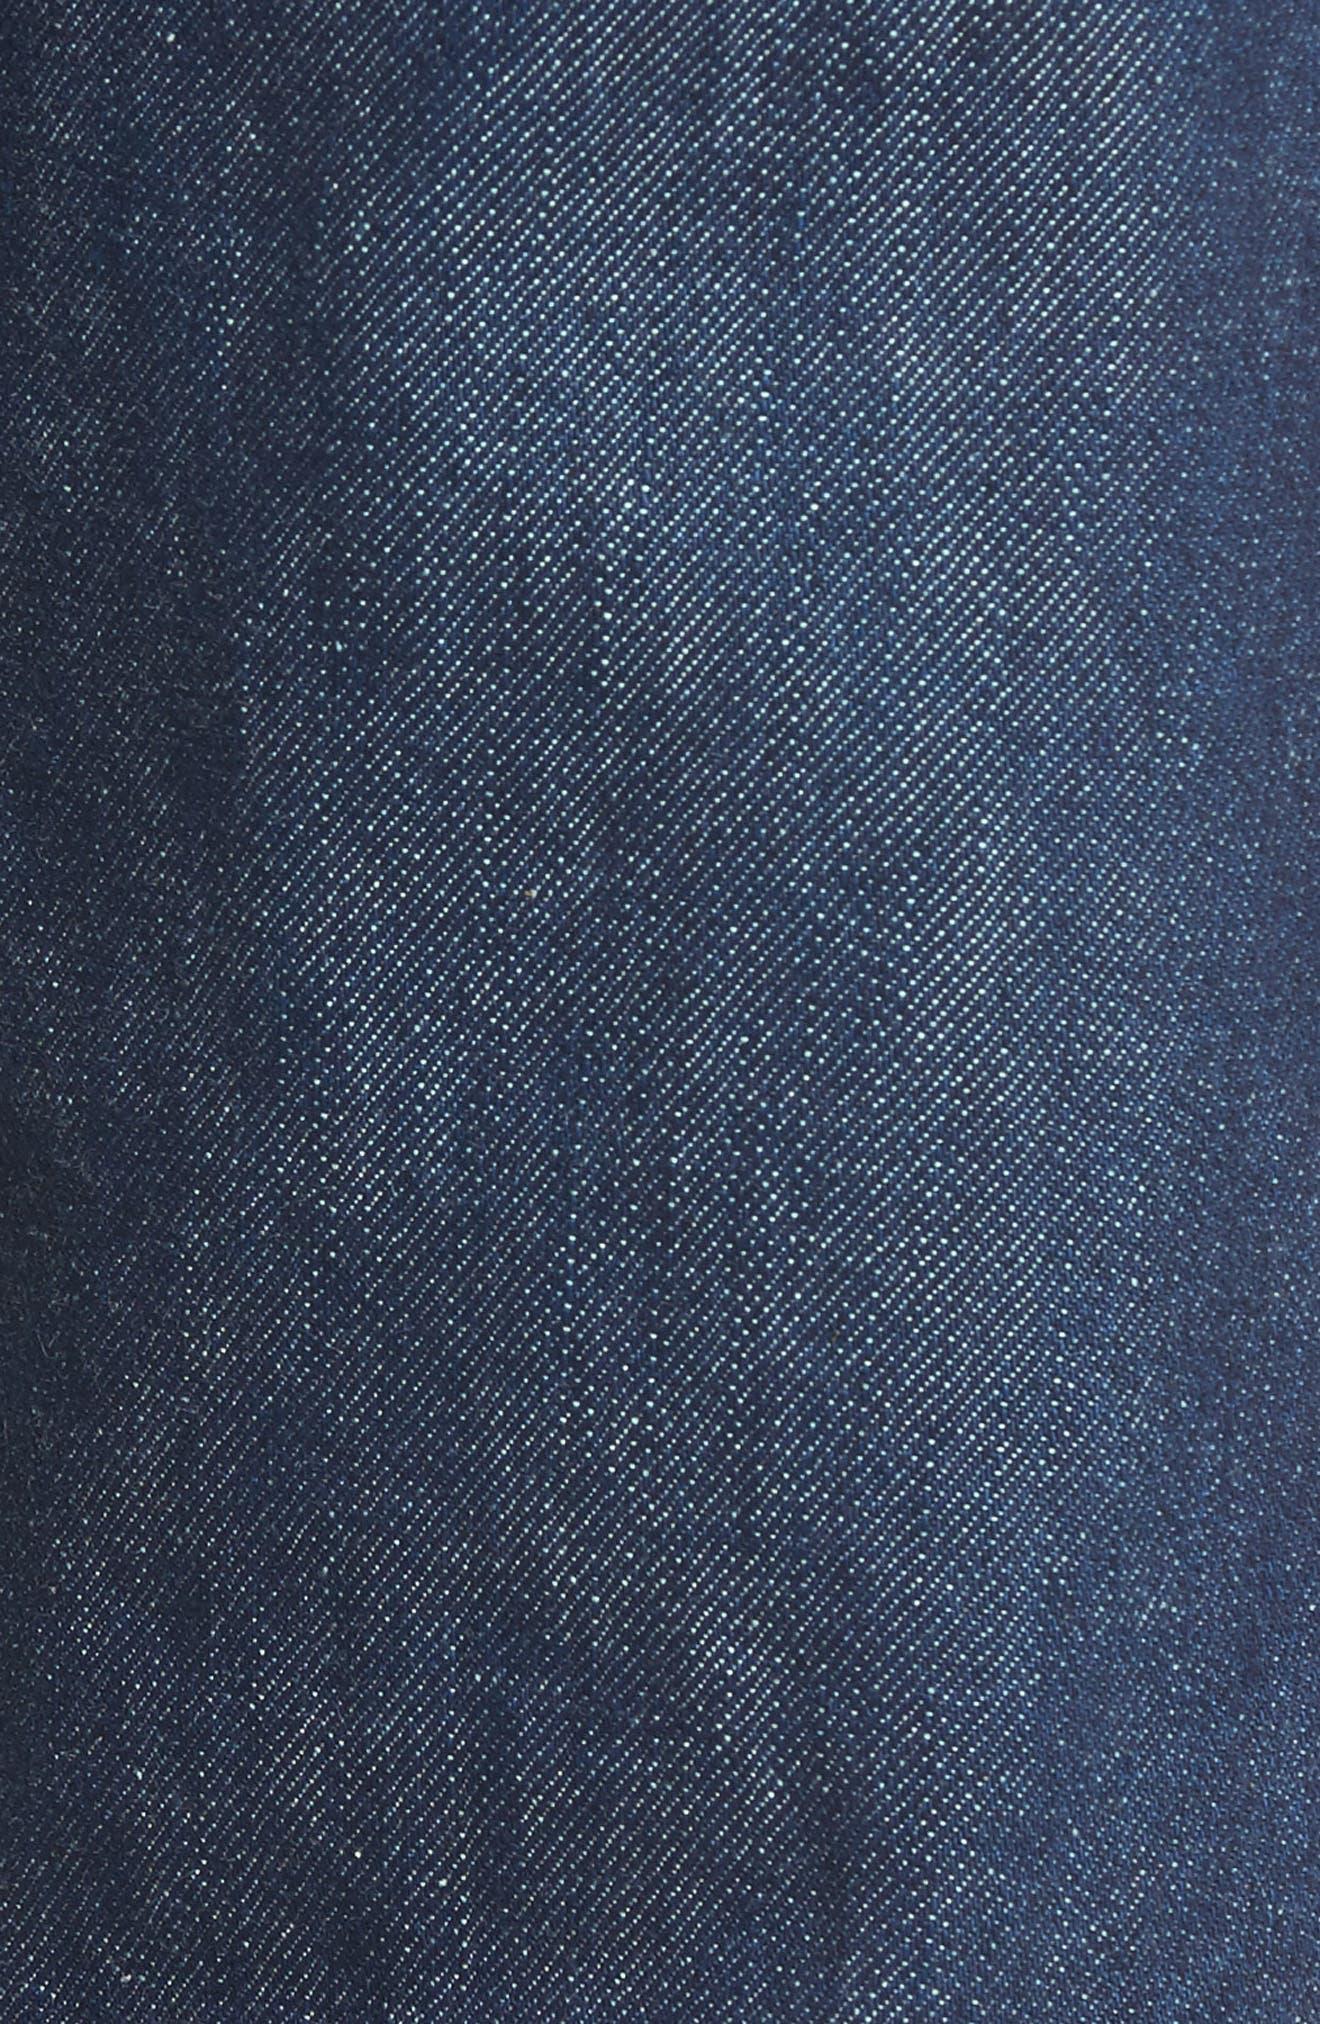 Fit 2 Slim Fit Selvedge Jeans,                             Alternate thumbnail 5, color,                             427